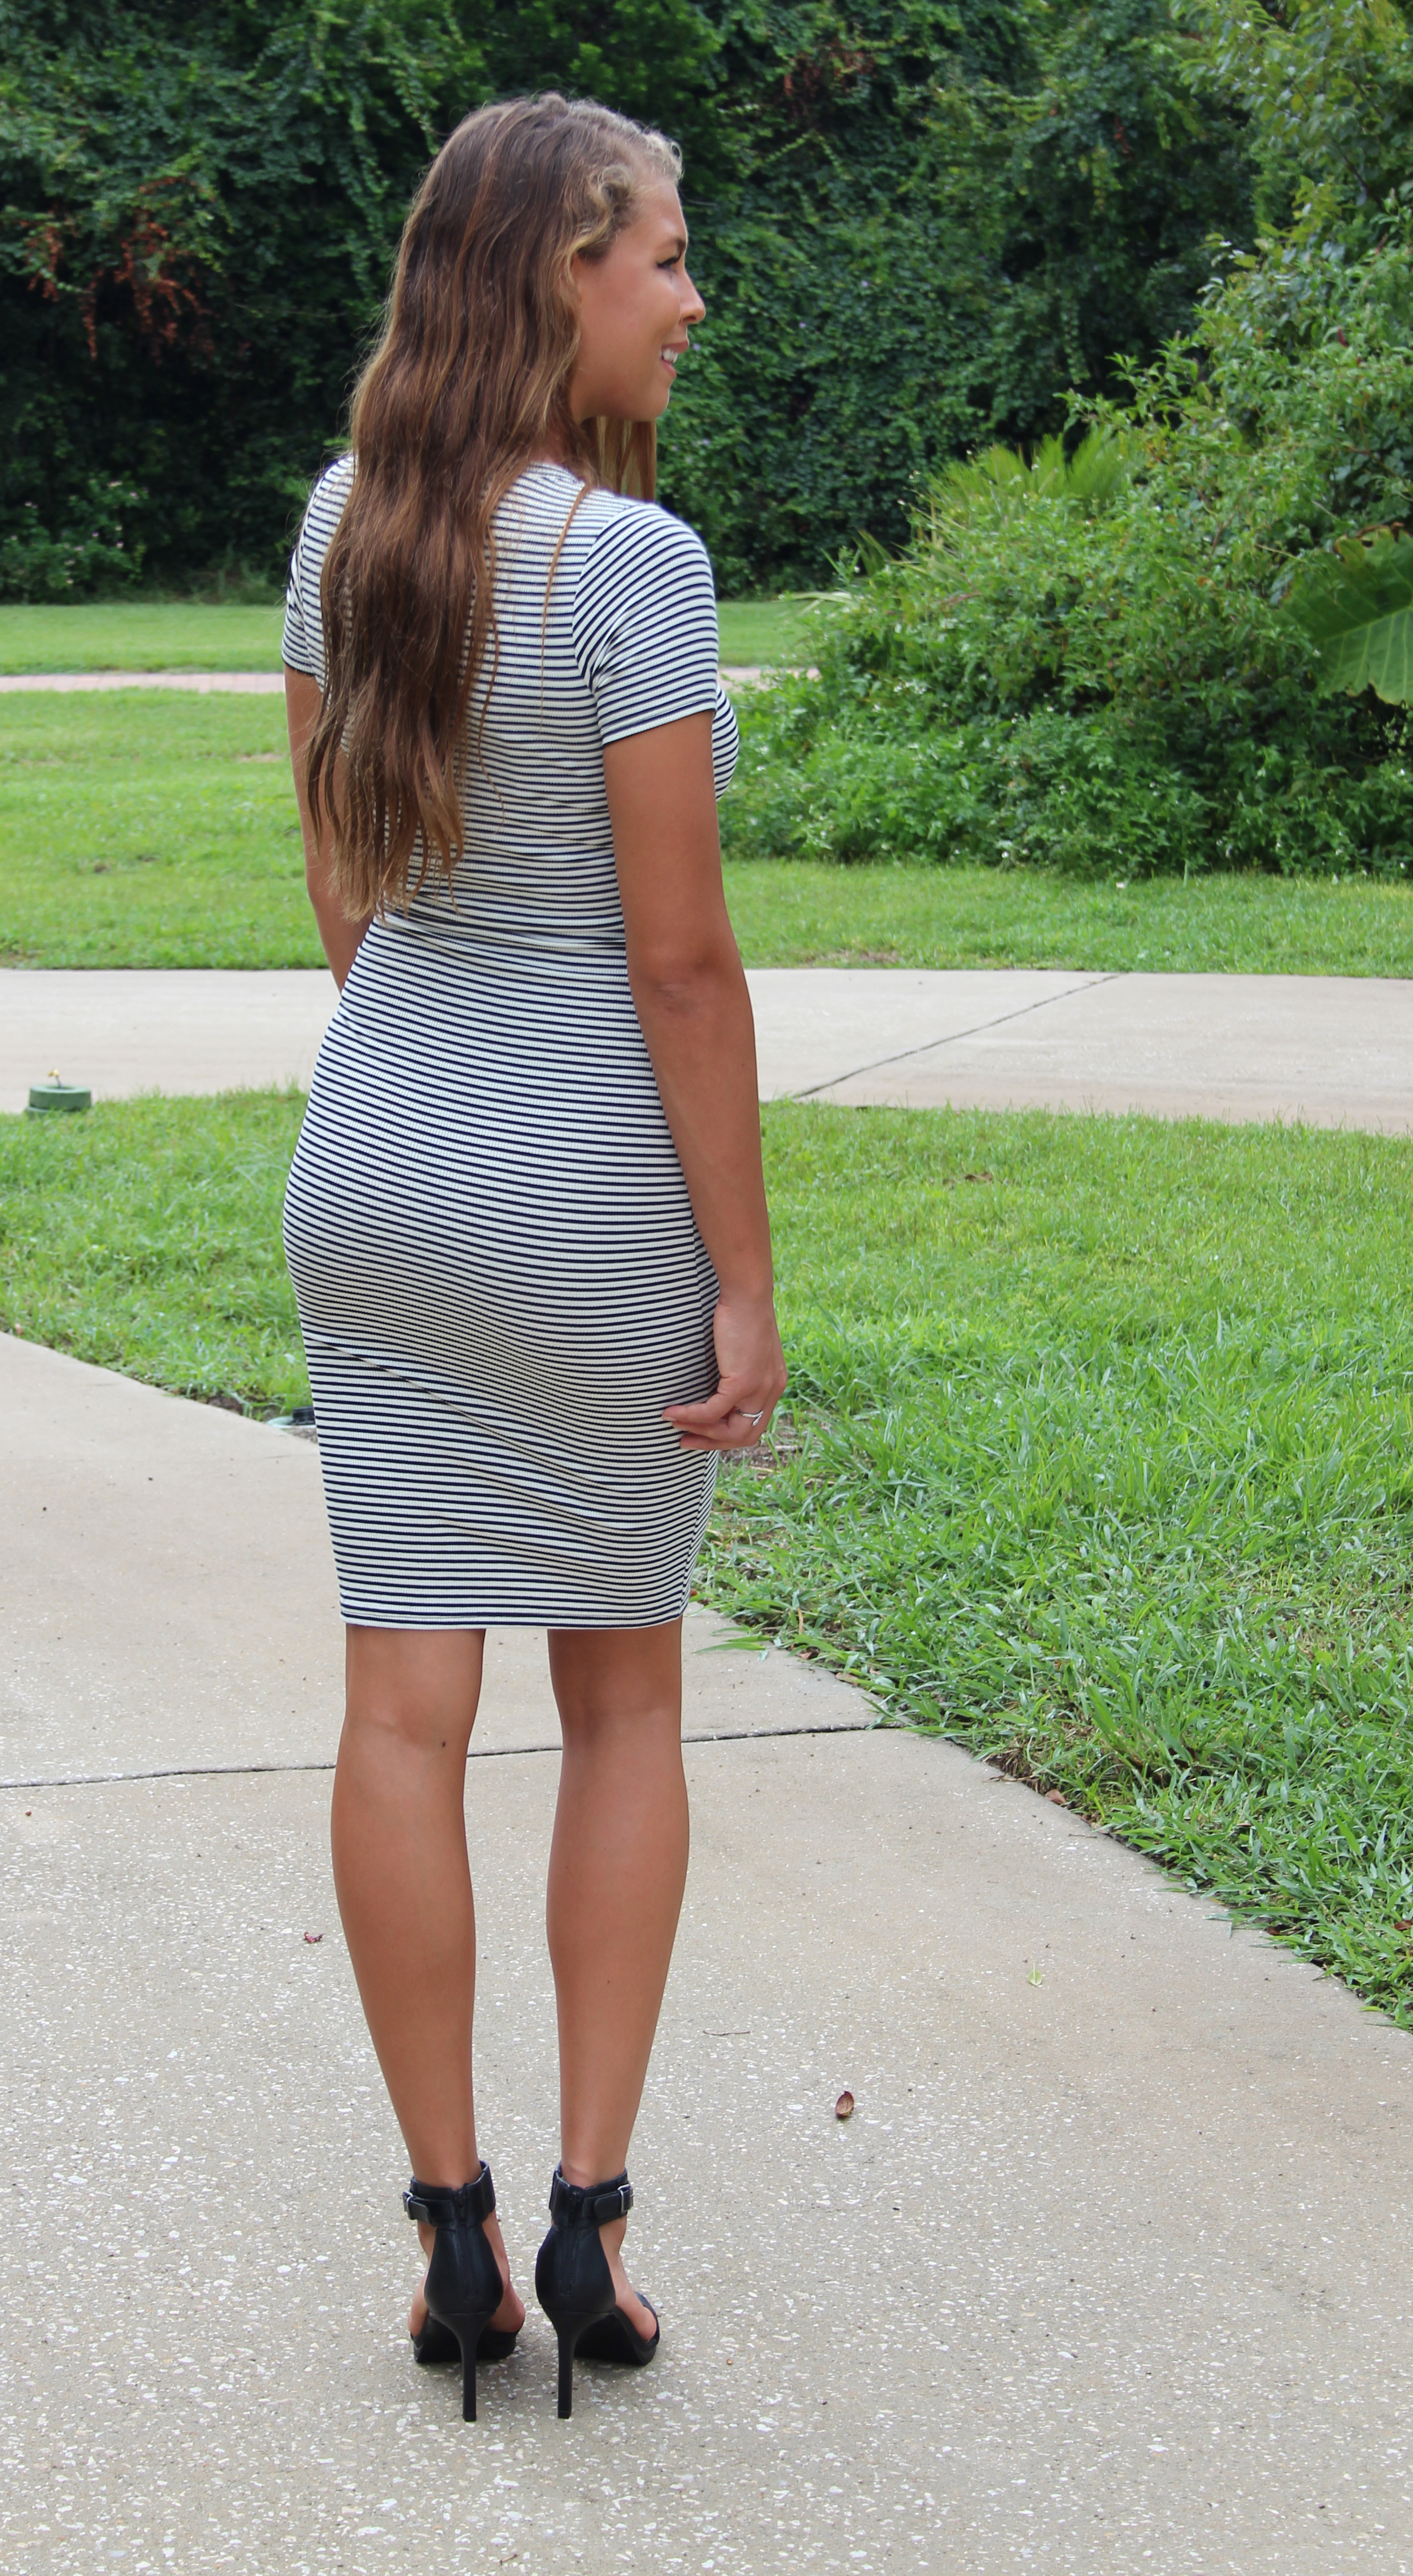 girls caught short pics